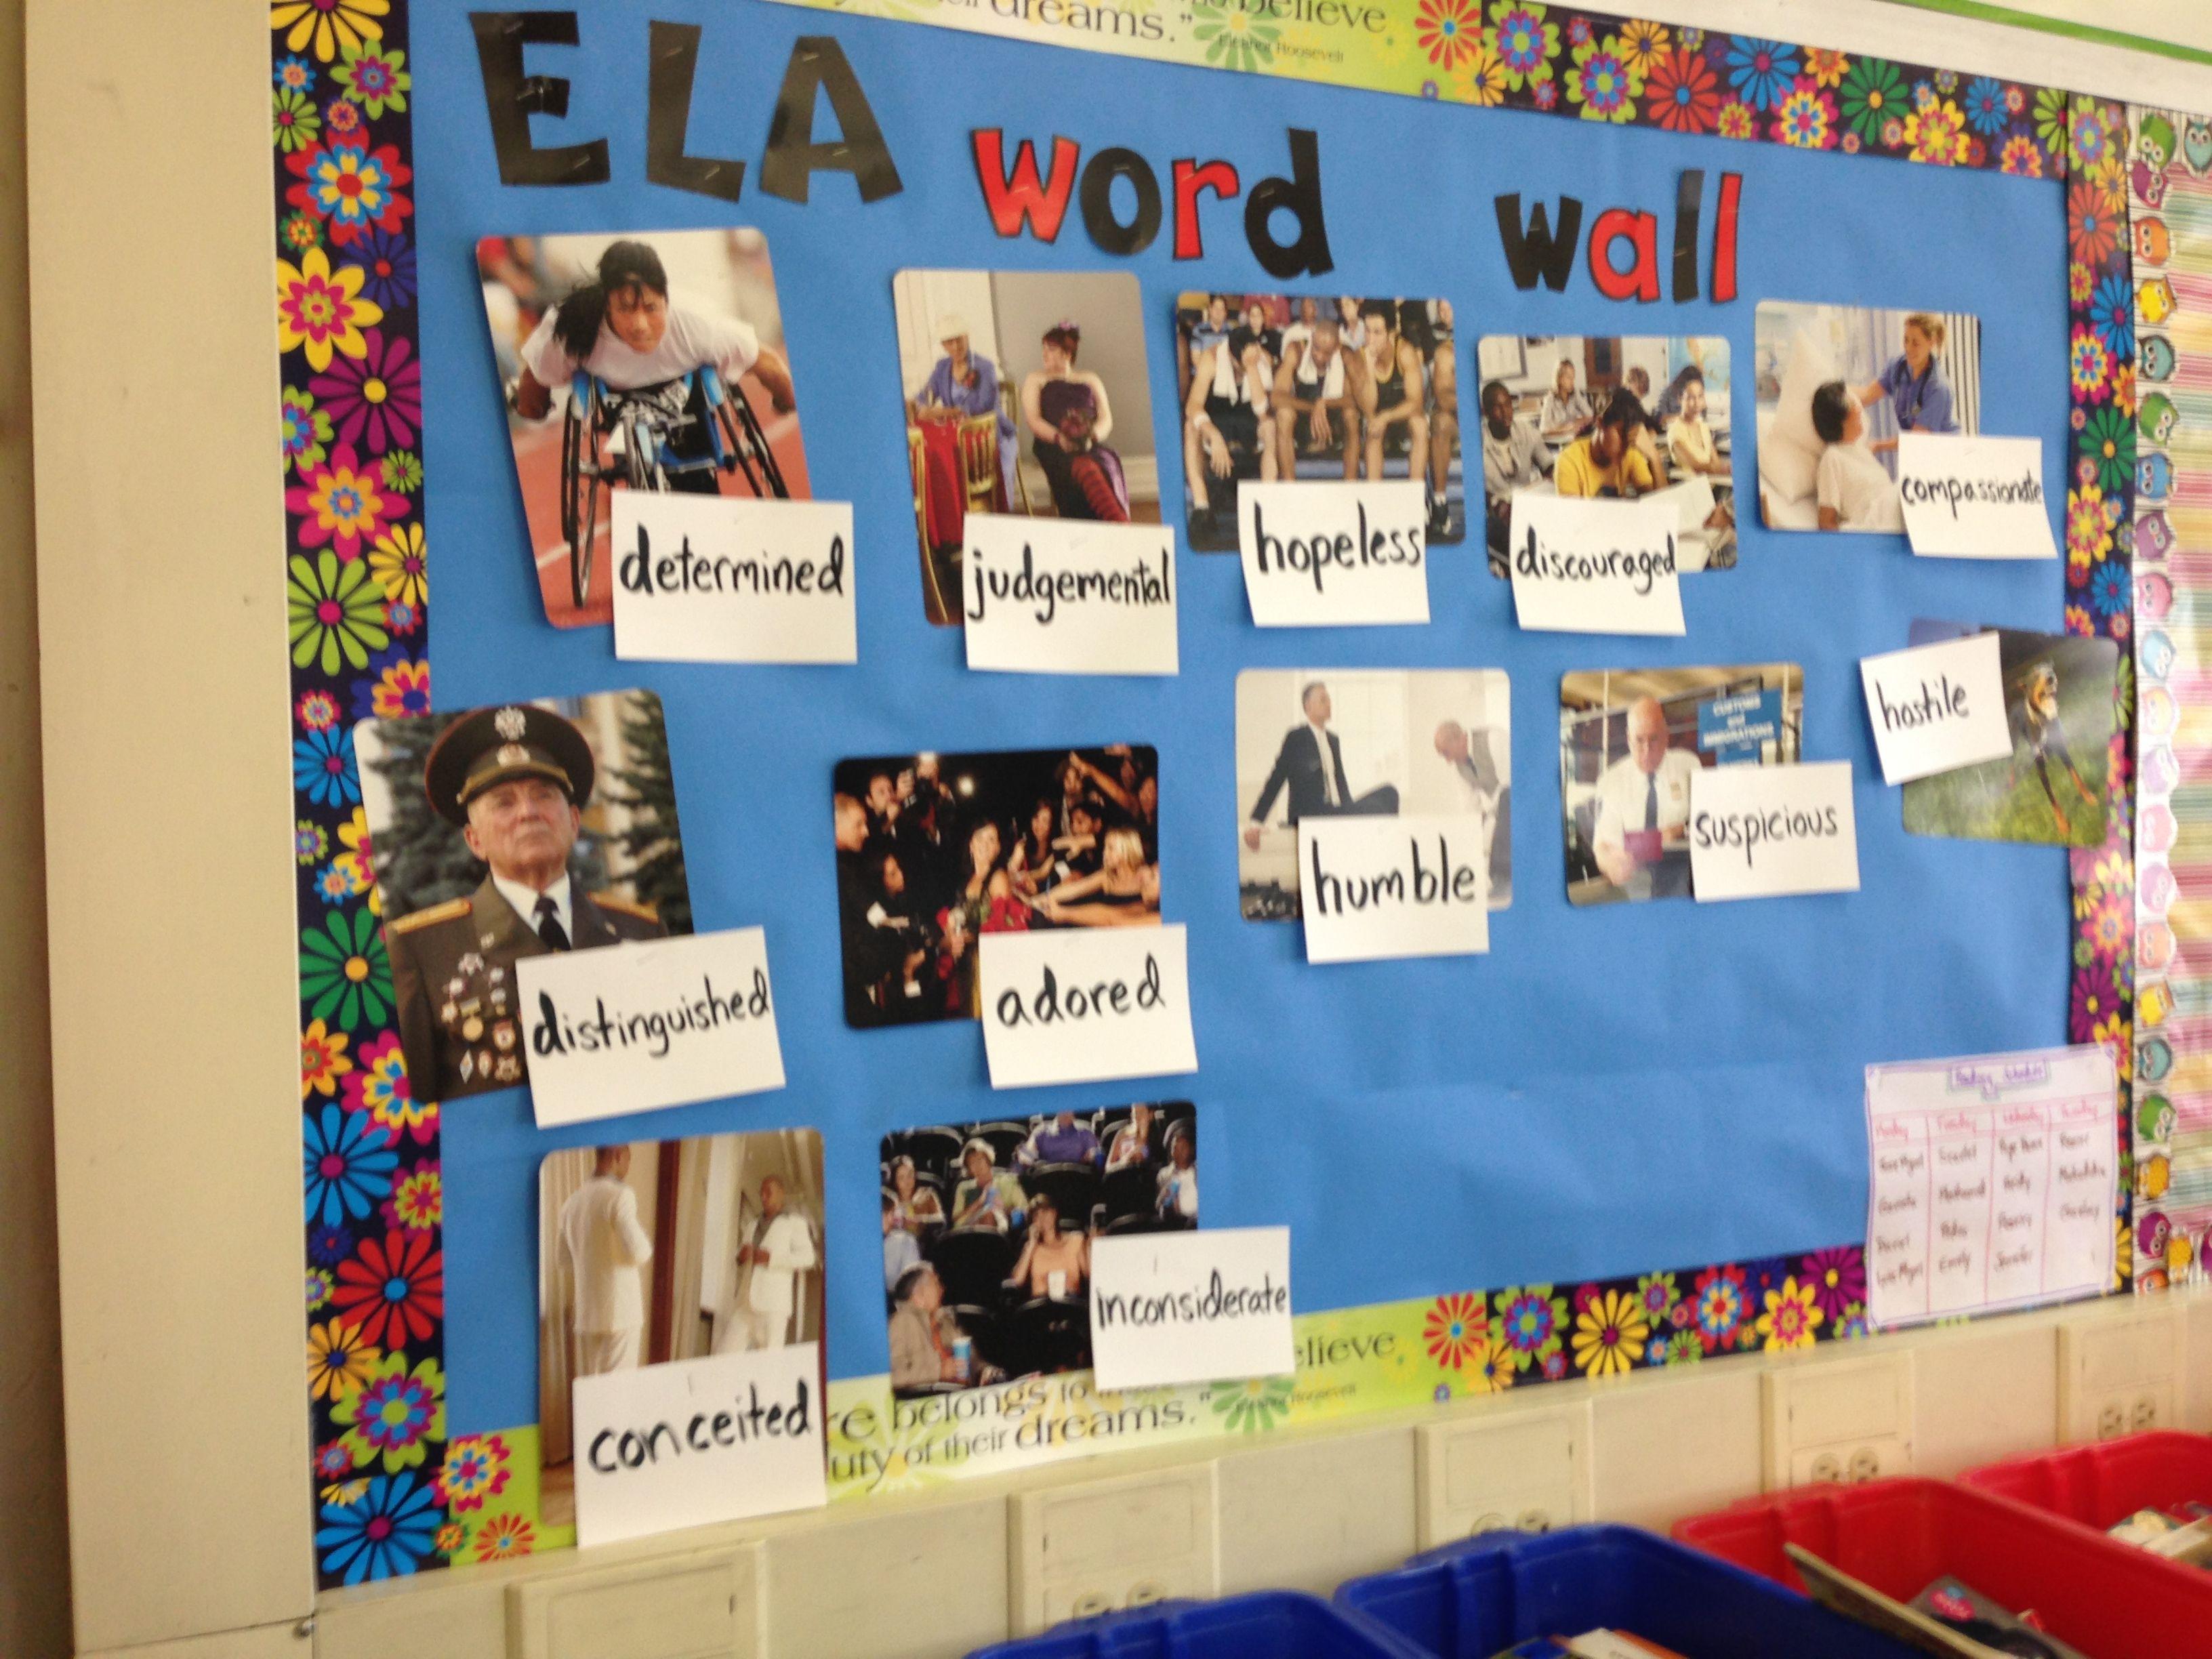 Esl Word Wall